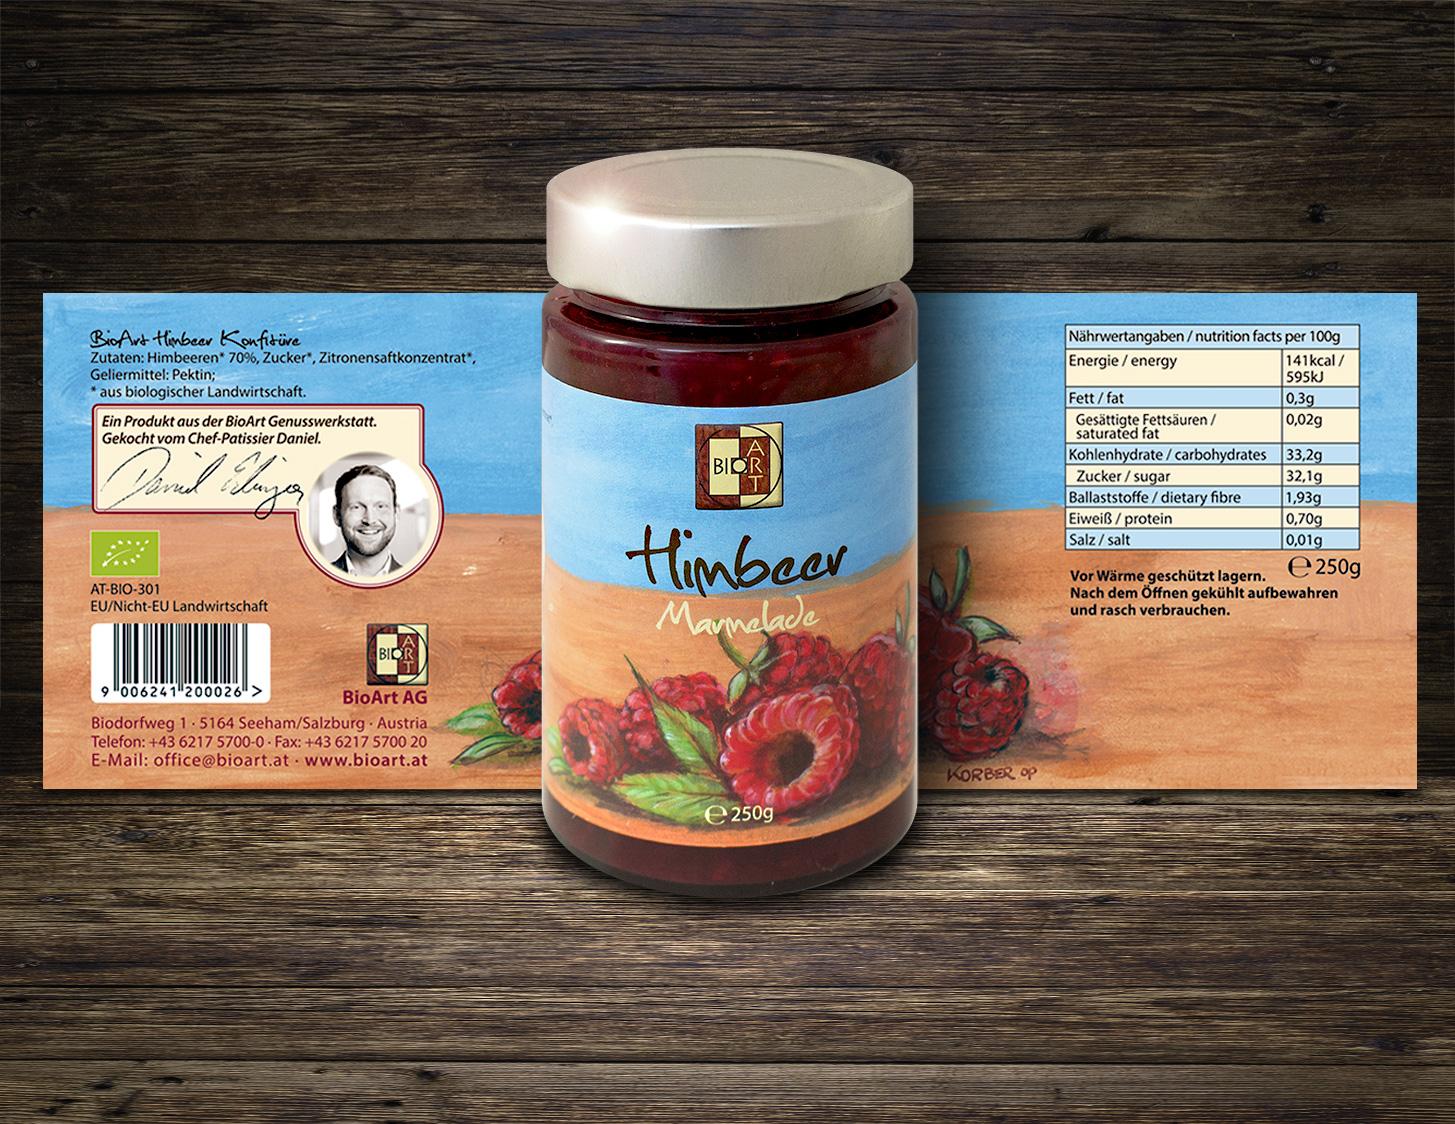 Marmelade, wie bei Oma.